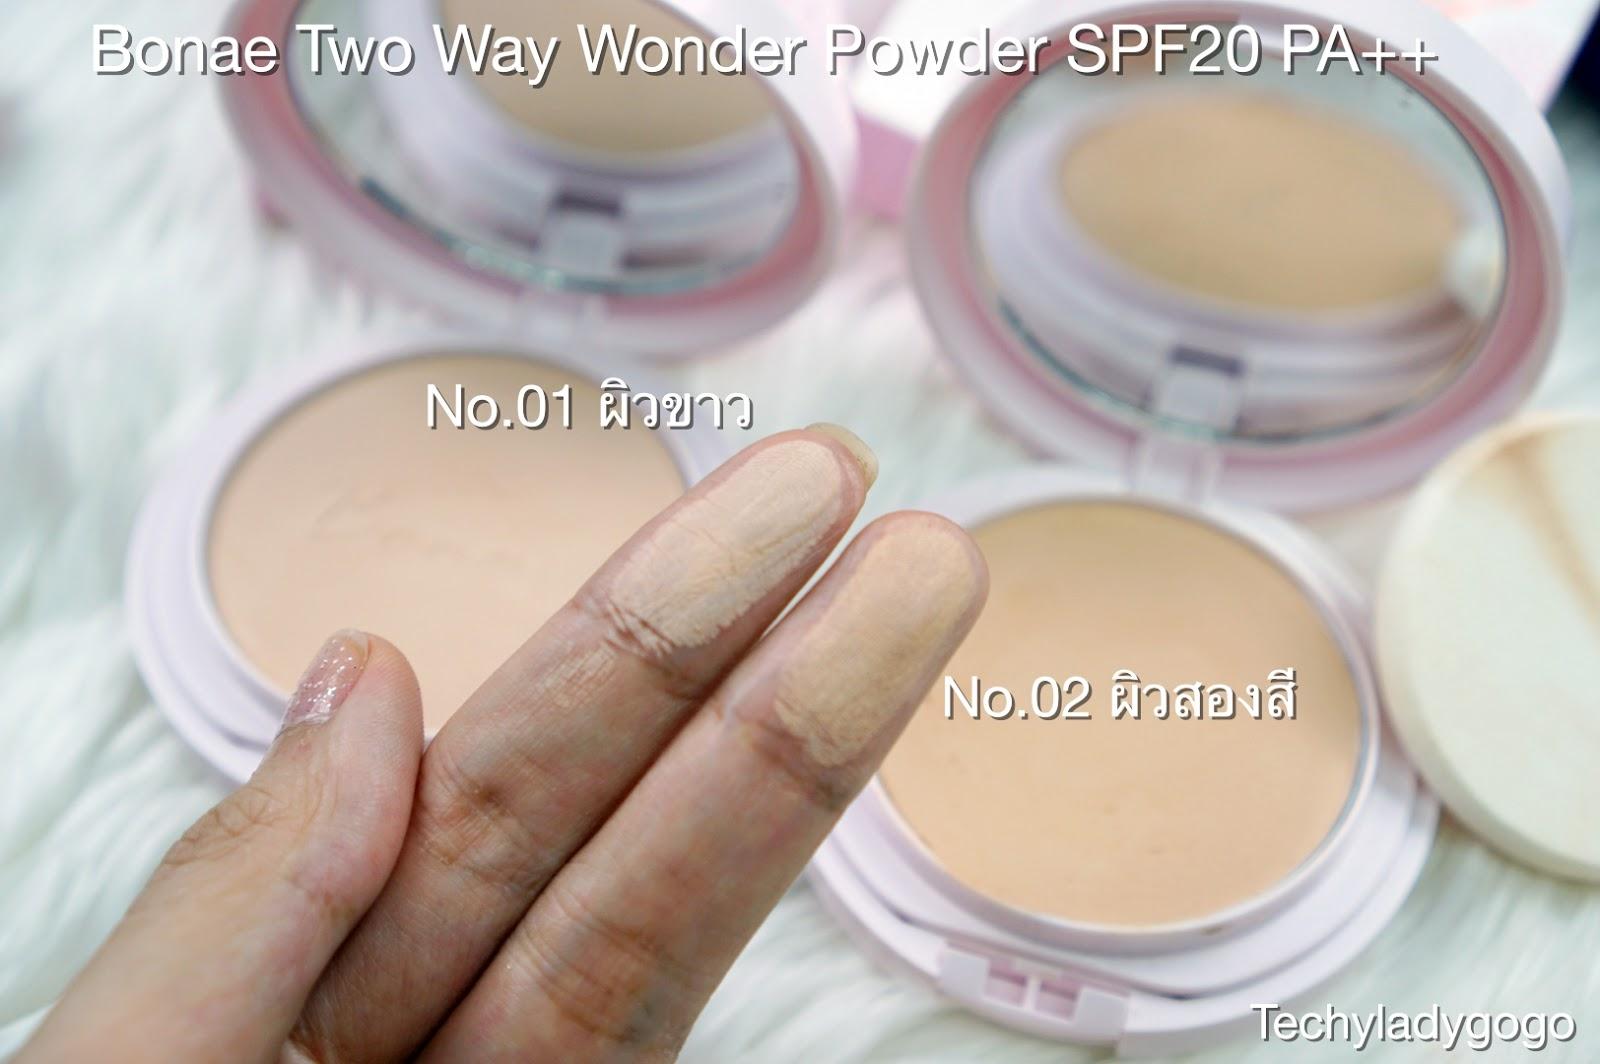 Bonae Two Way Wonder Powder SPF20 PA++ แป้งบอนเน่ ทูเวย์ วันเดอร์ พาวเดอร์ รีวิว แป้งคุมมัน แป้งรองพื้น แป้งพัฟ แป้งคนไทย แป้งปกปิด Full Coverage มี 2 สีให้เลือก